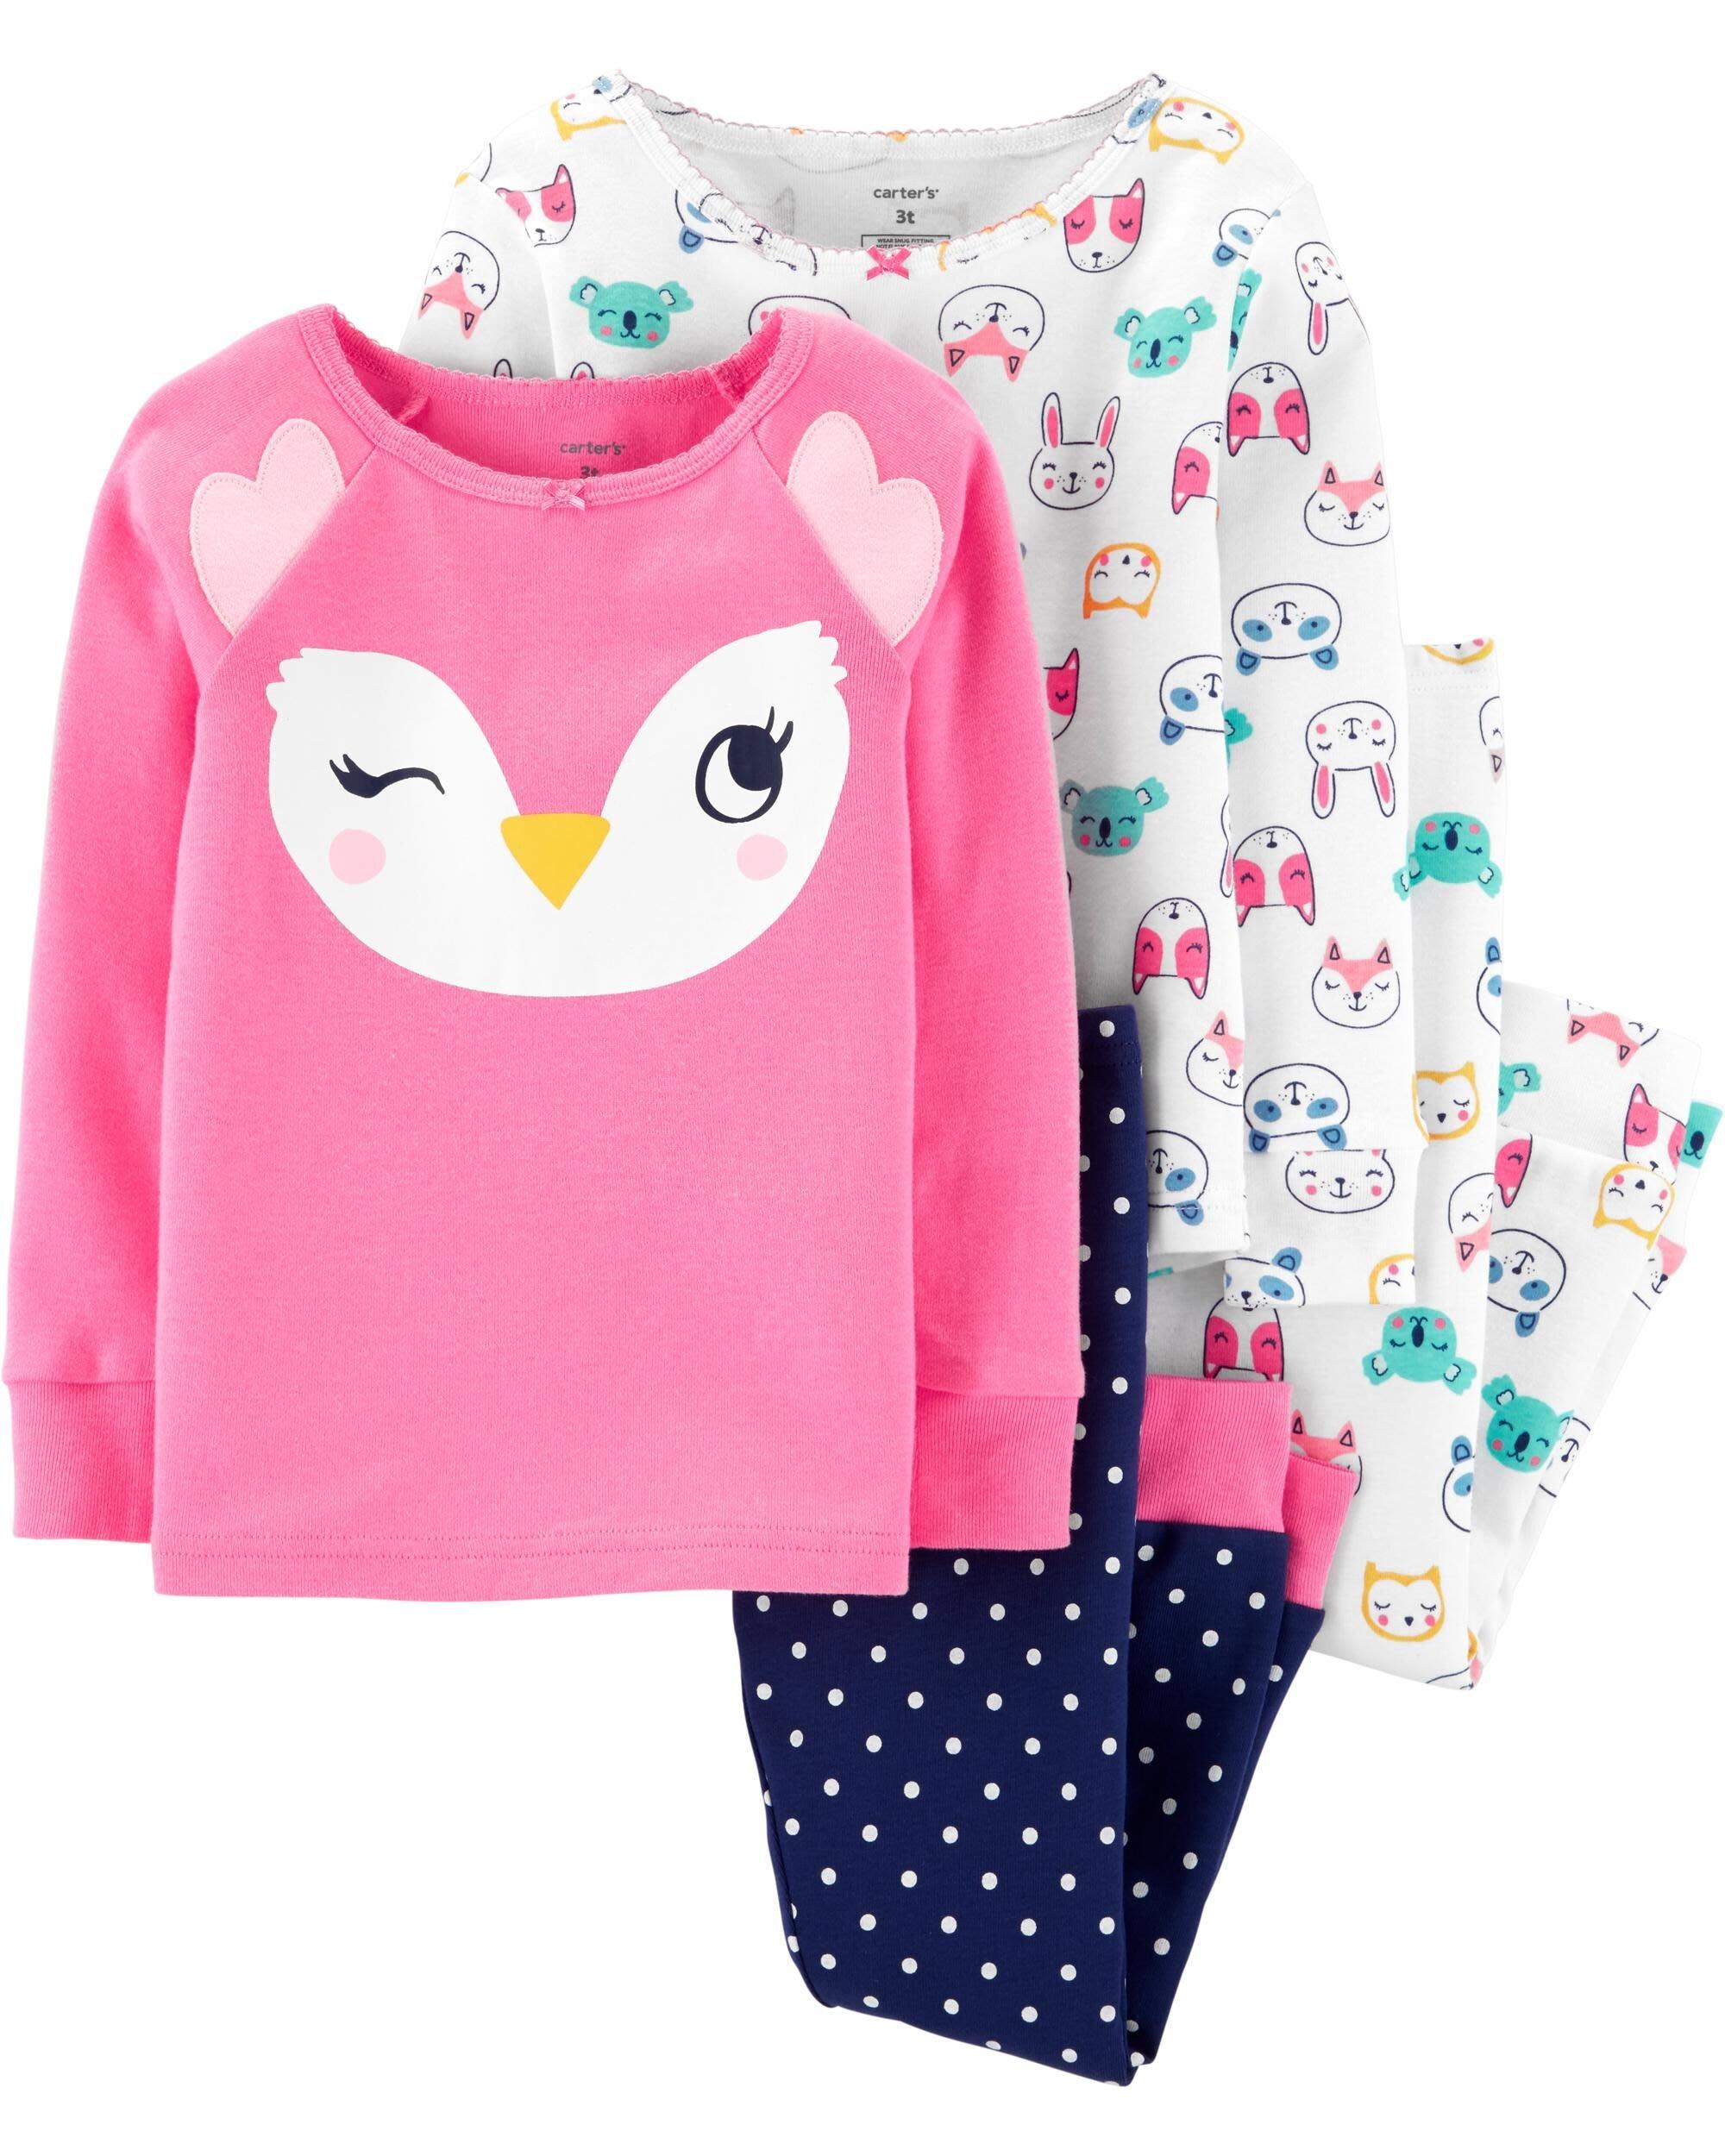 MIABABY 美國童裝 Carters 小女童動物睡衣2套組 5T 現貨